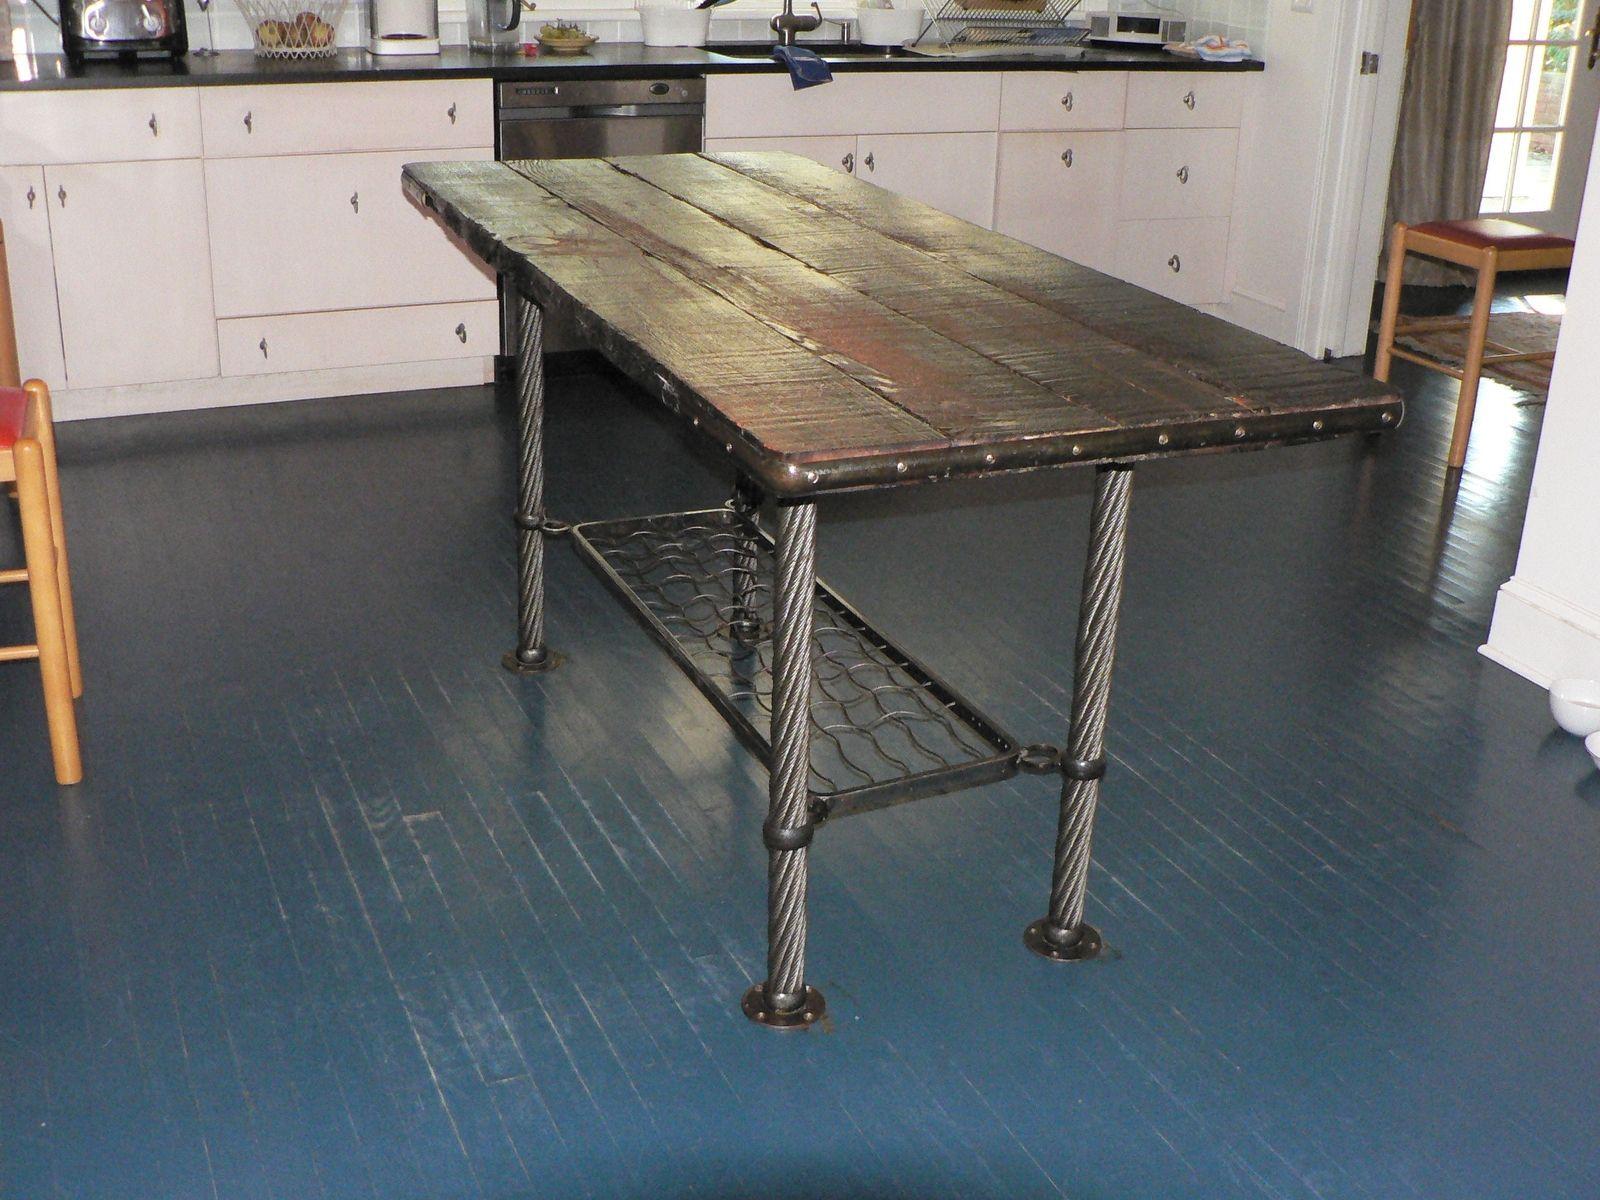 9 delectable kitchen work table base kitchen work  9 delectable kitchen work table base kitchen work tables for sale      rh   pinterest com